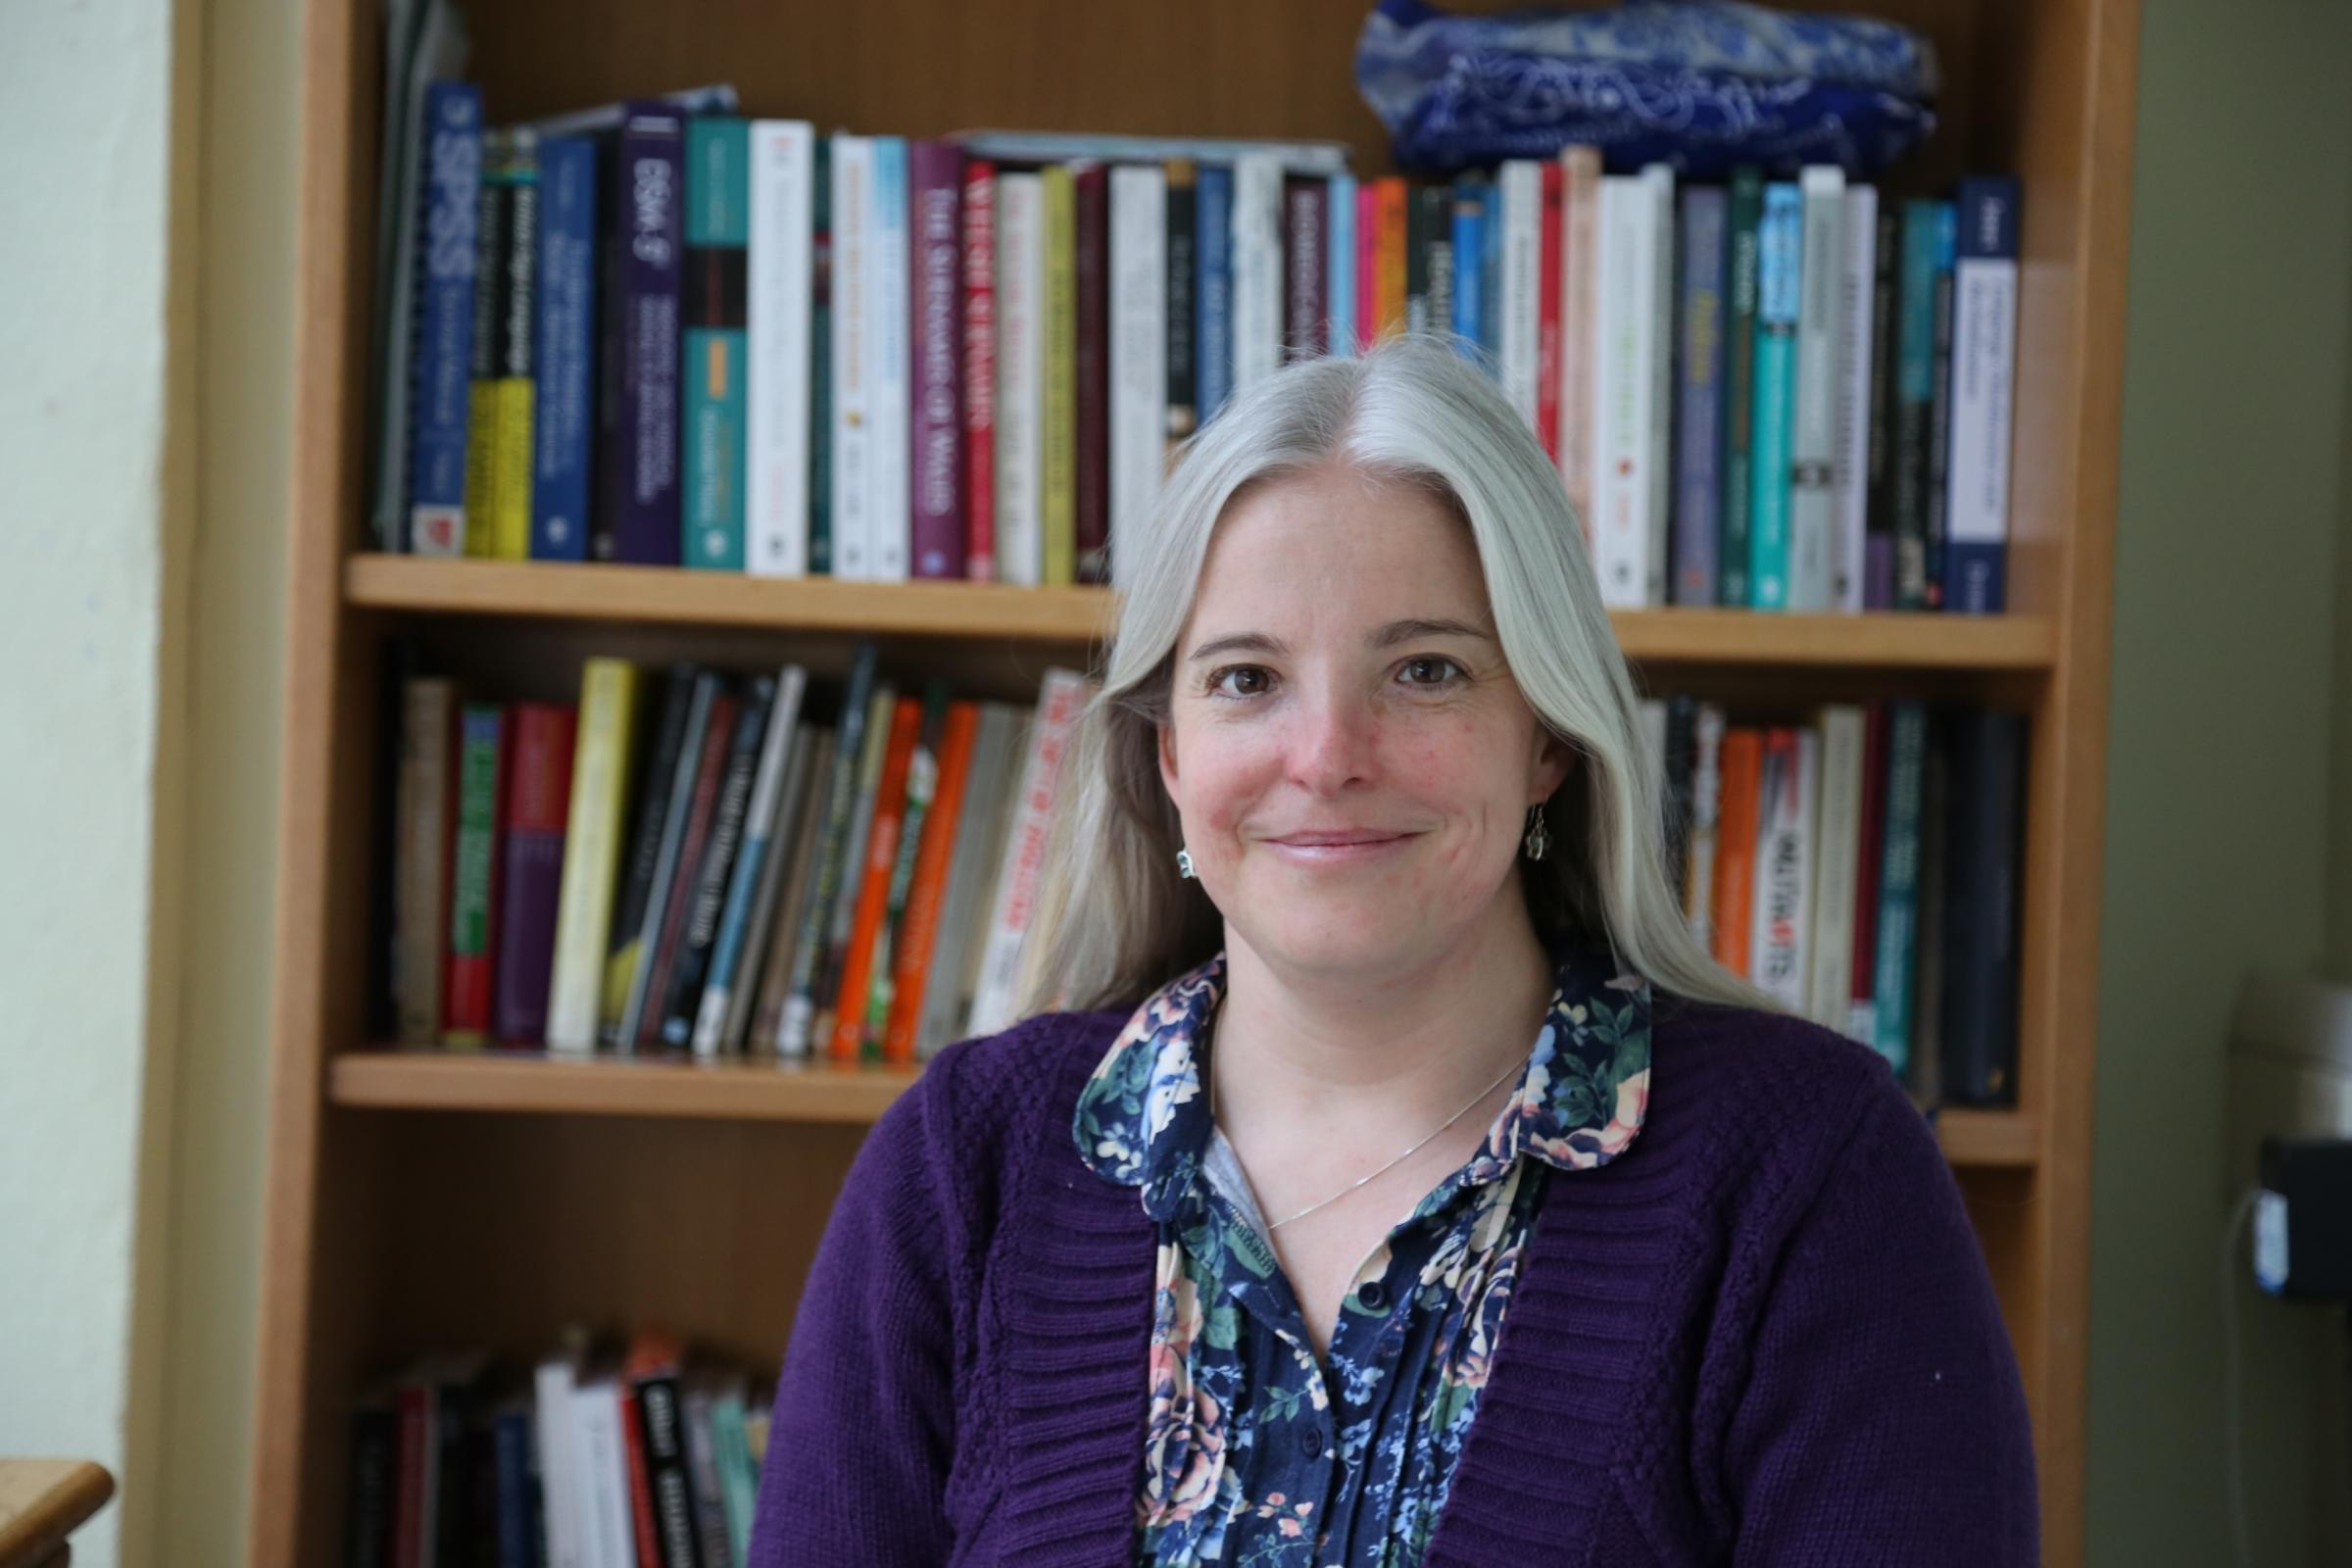 Glyndwr academic studies psychology behind Ridley Scott's Alien